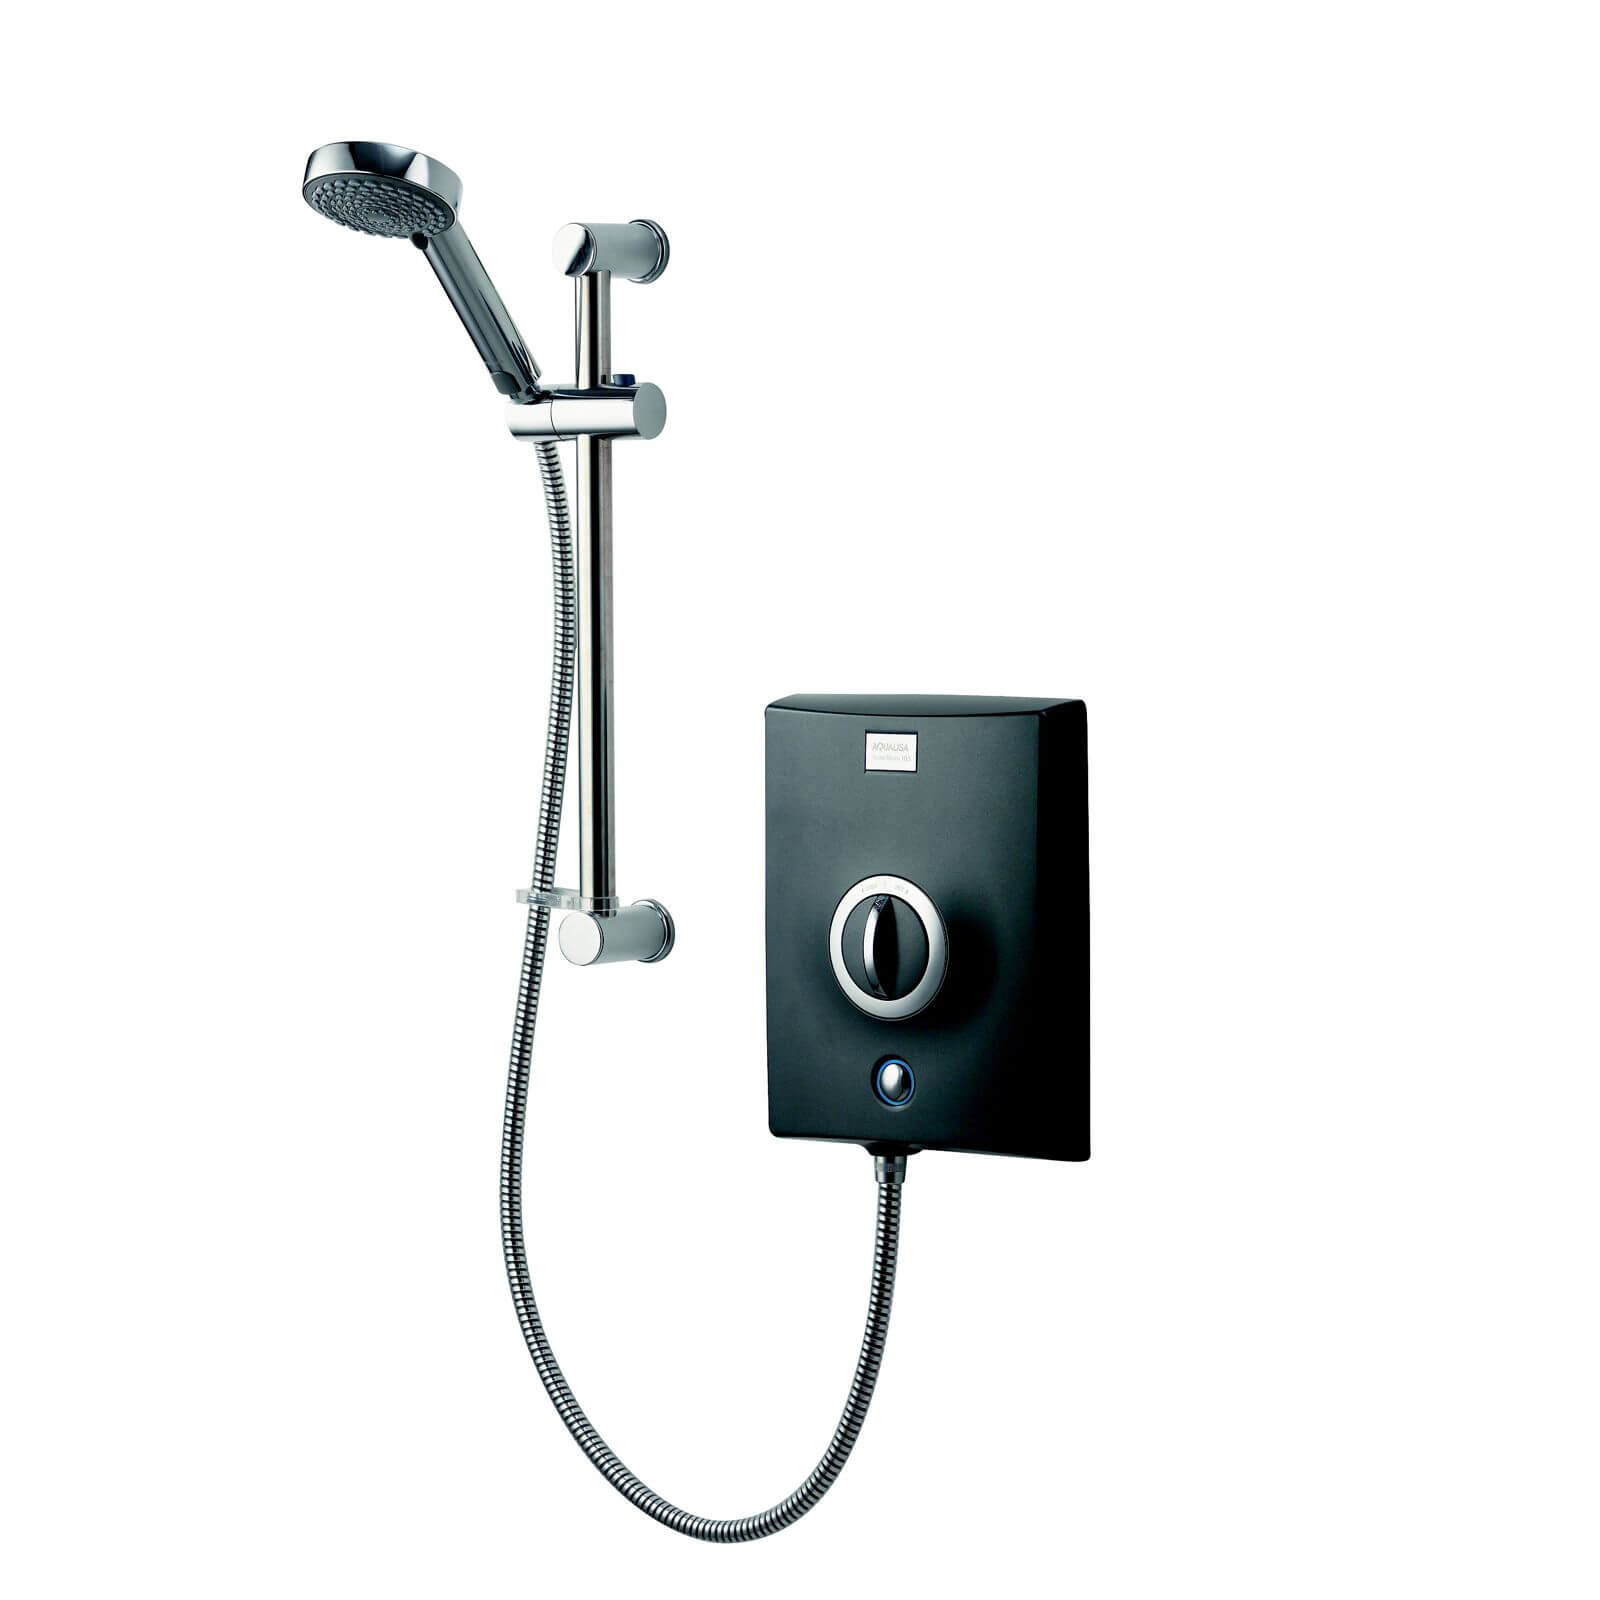 Aqualisa Quartz 10.5kw Electric Shower - Graphite/Chrome